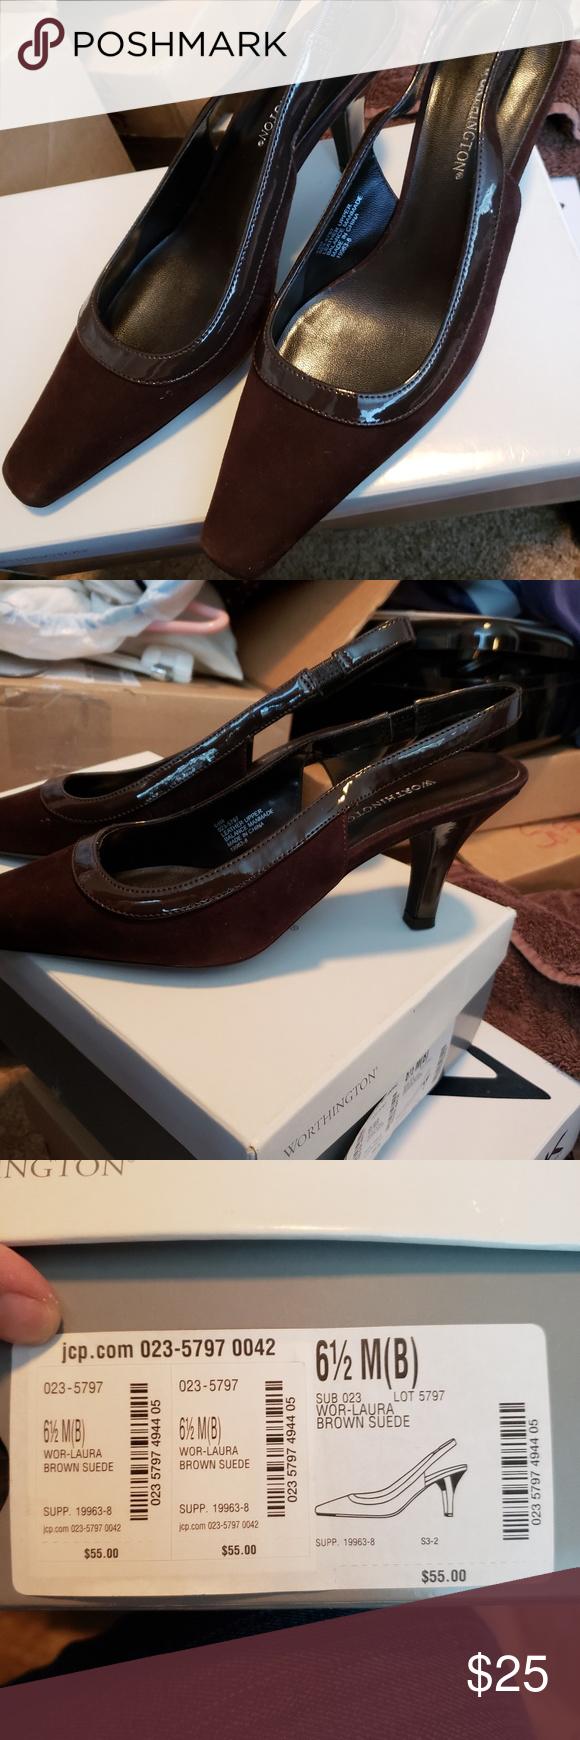 Worthington Brown Suede Heels New In Box Worthington Brown Suede Heels From Jcpenney Size 6 5 Worthington Shoes Heels Brown Suede Heels Suede Heels Heels